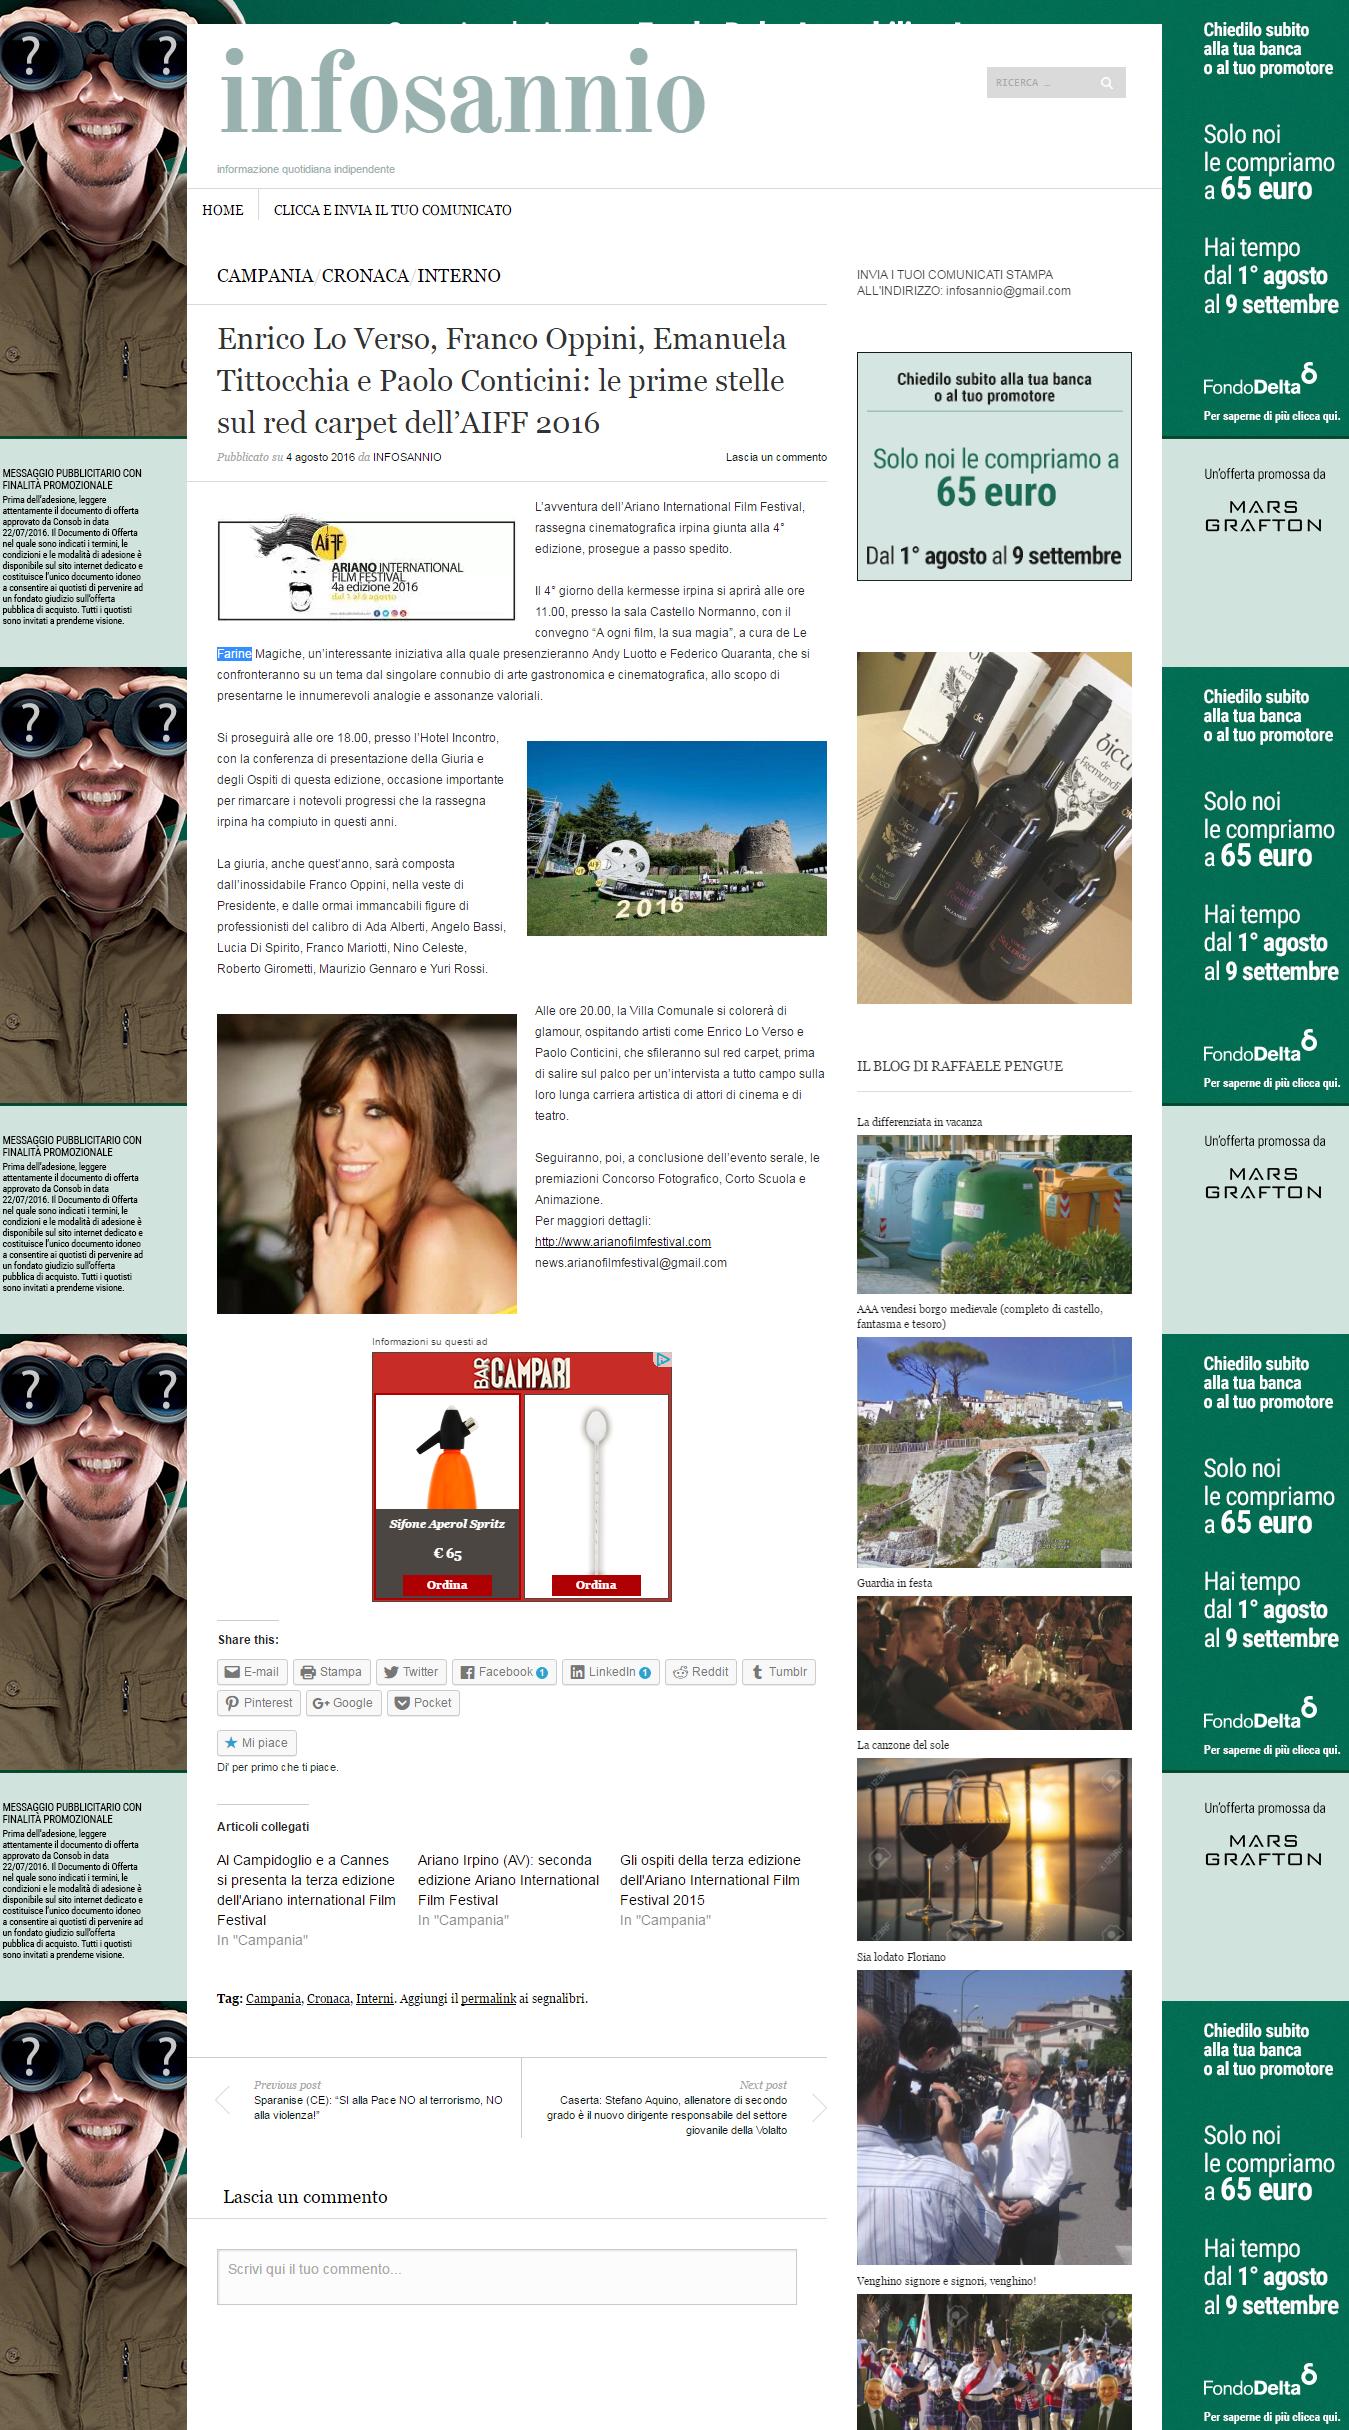 040816_infosannio.wordpress.com